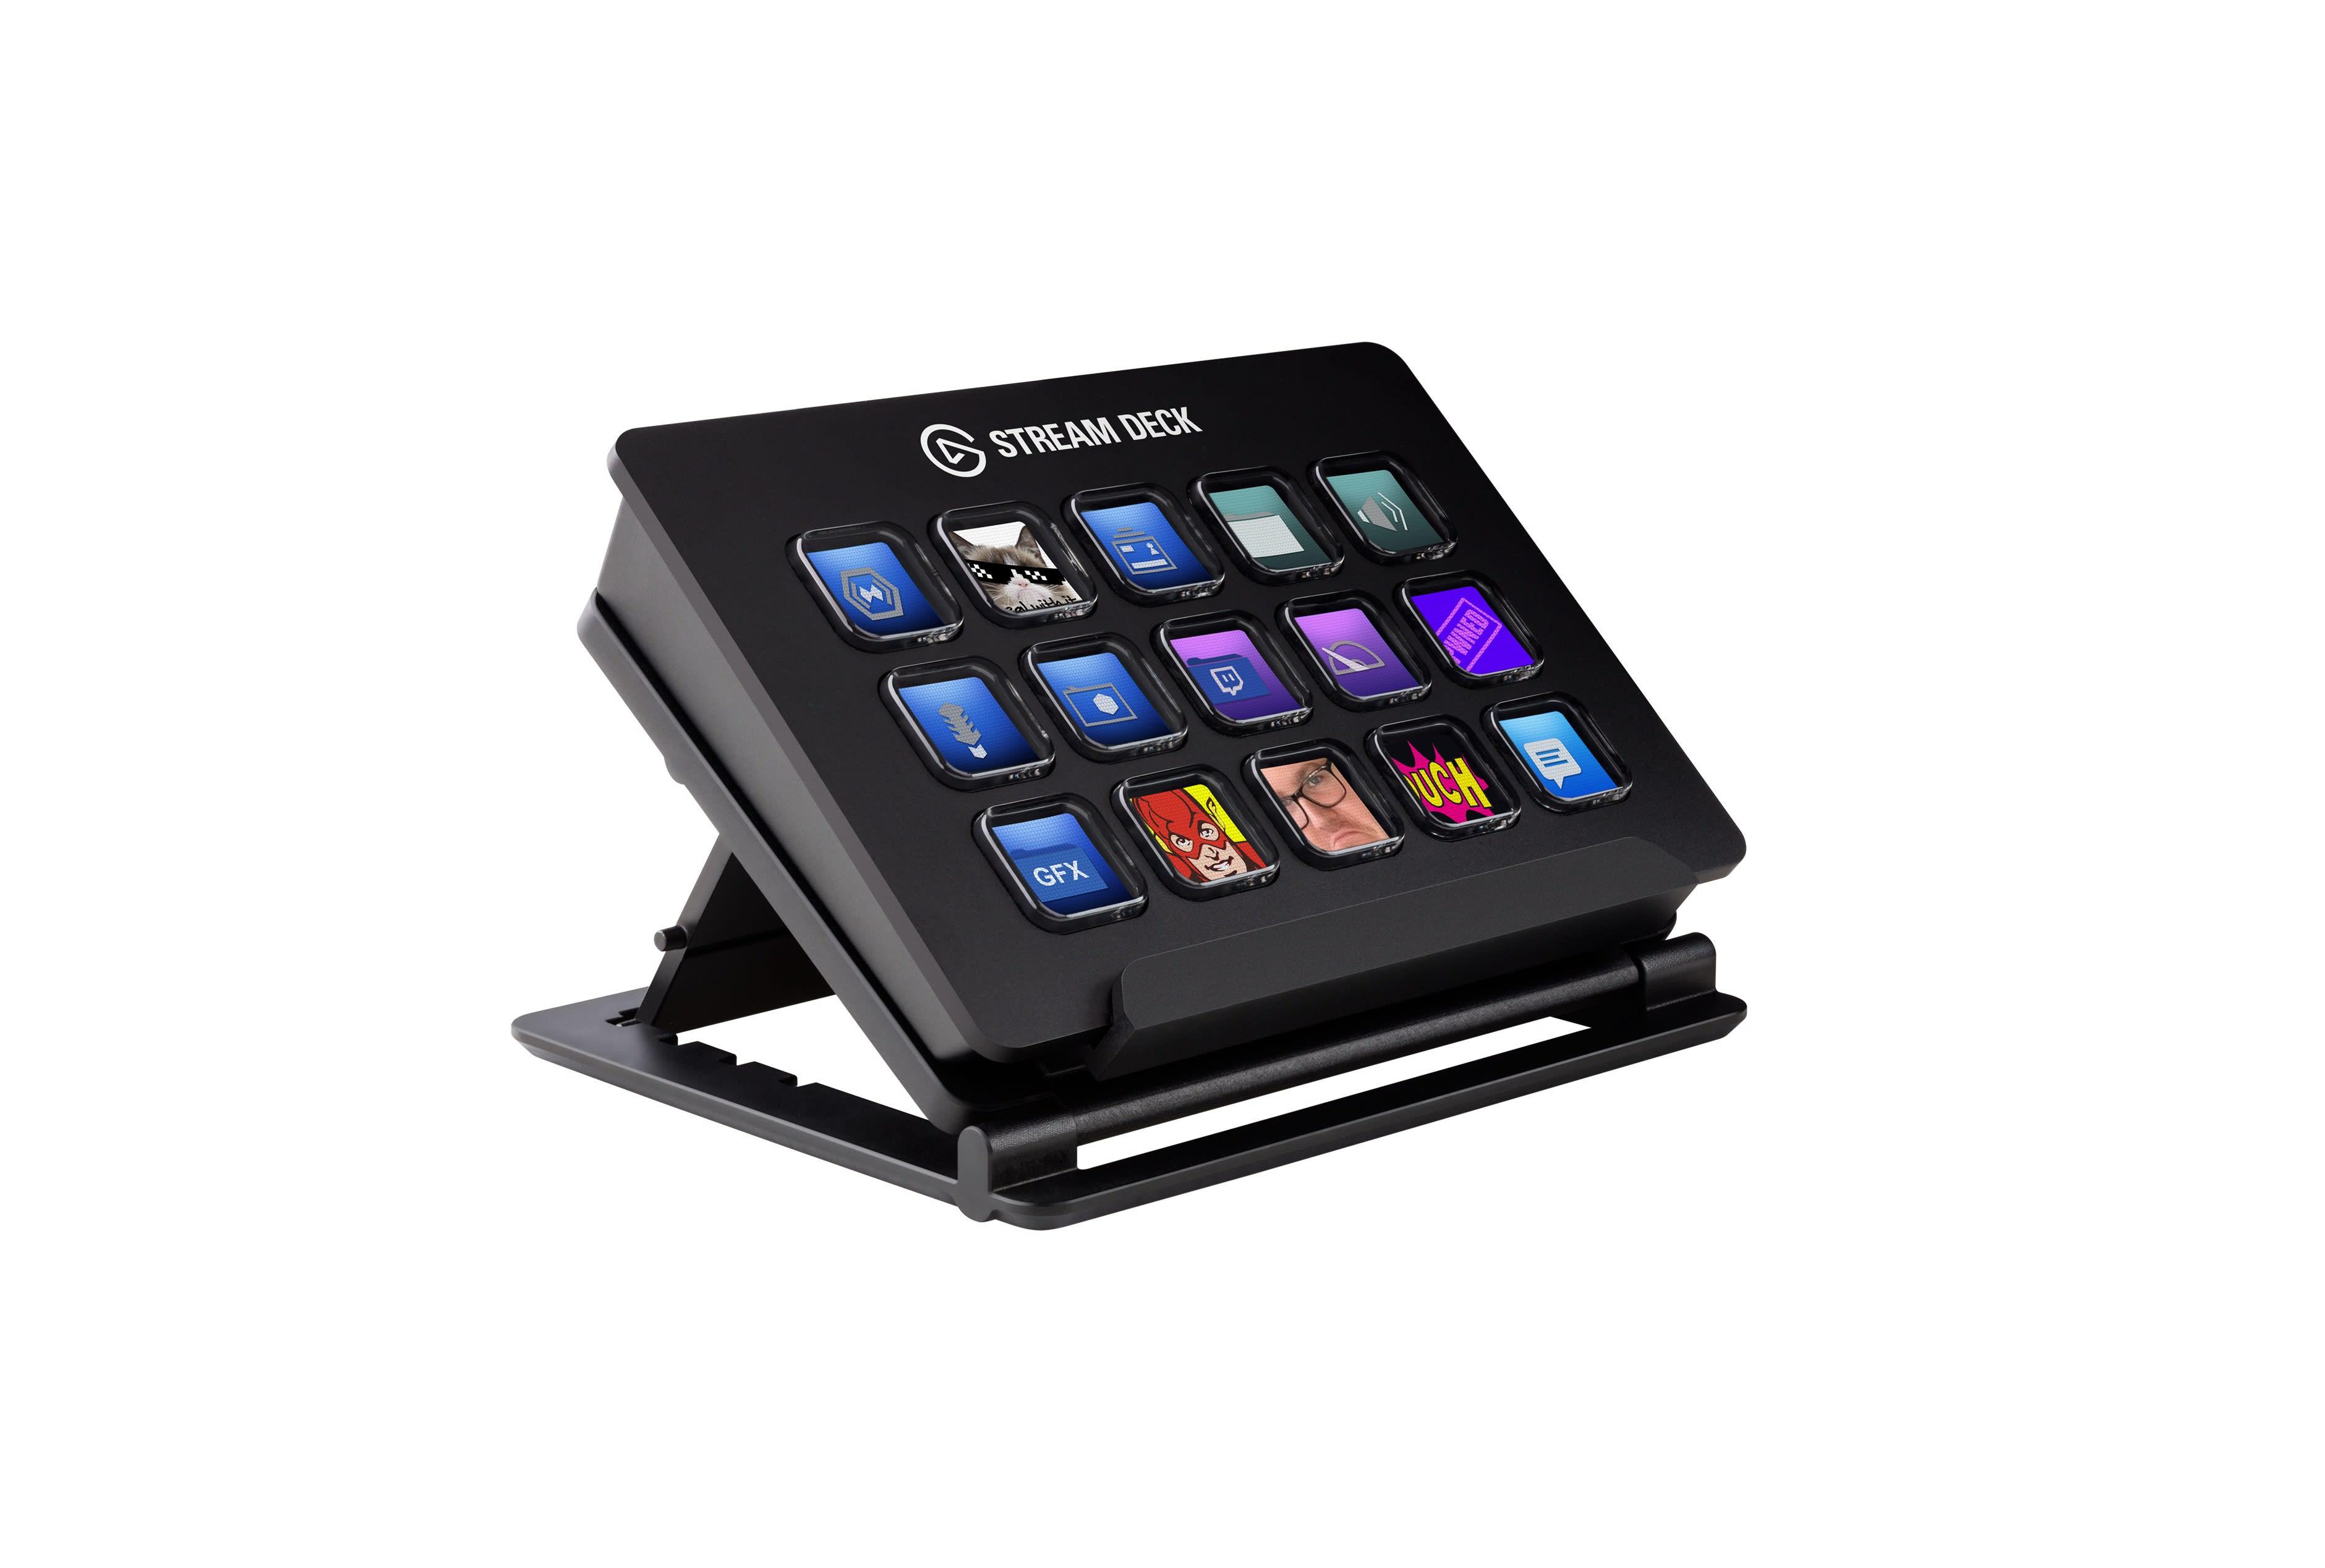 Elgato's control pad is a livestreaming sidekick